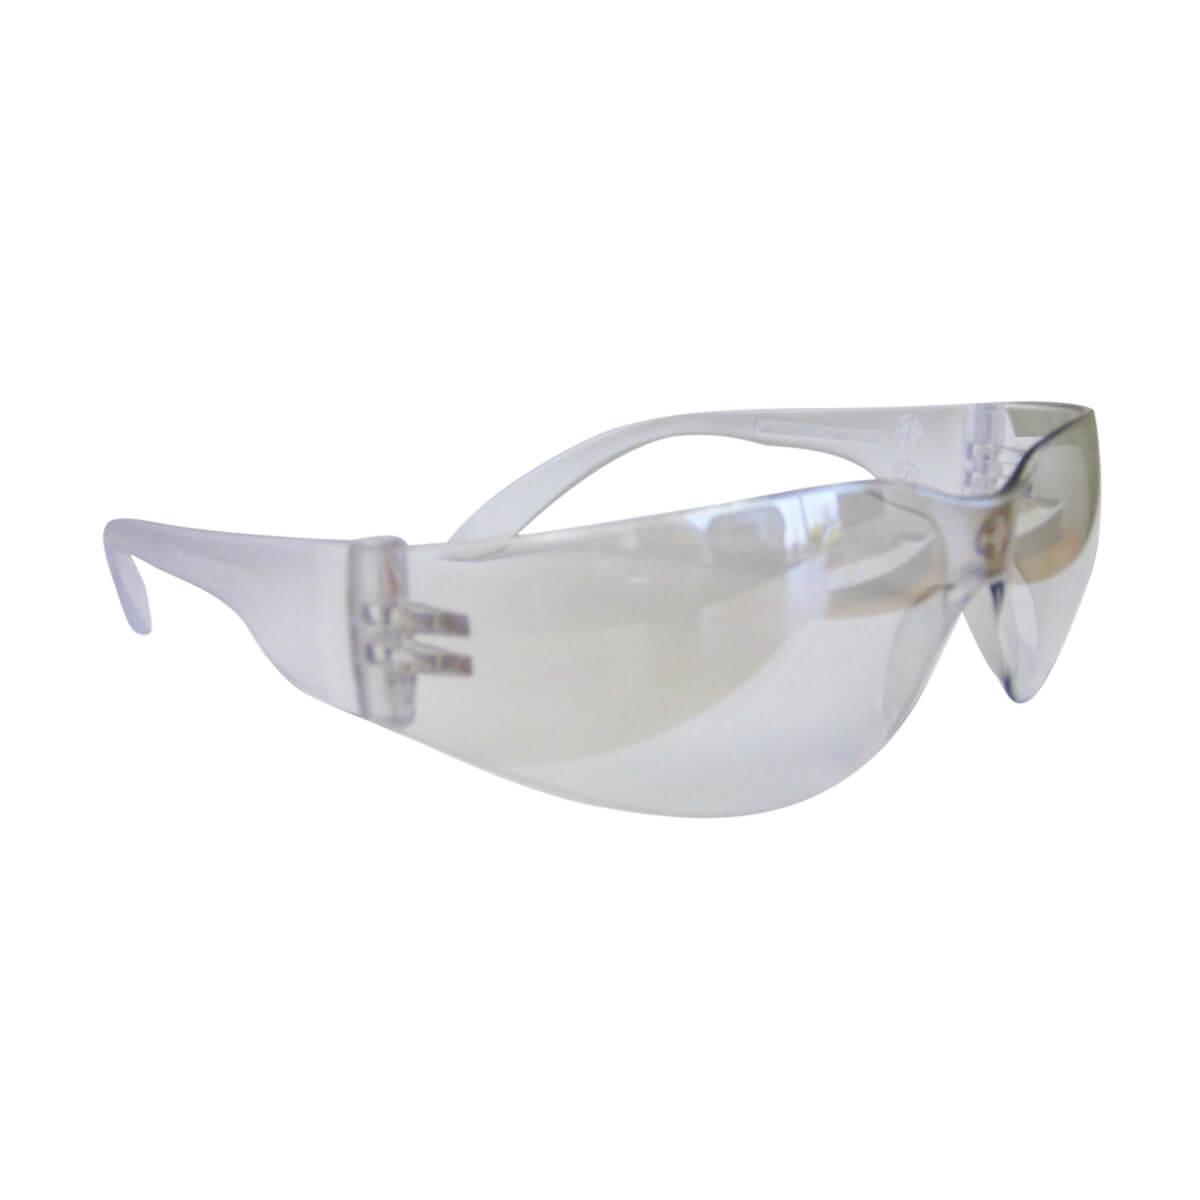 Protective Eyewear - Clear Lens